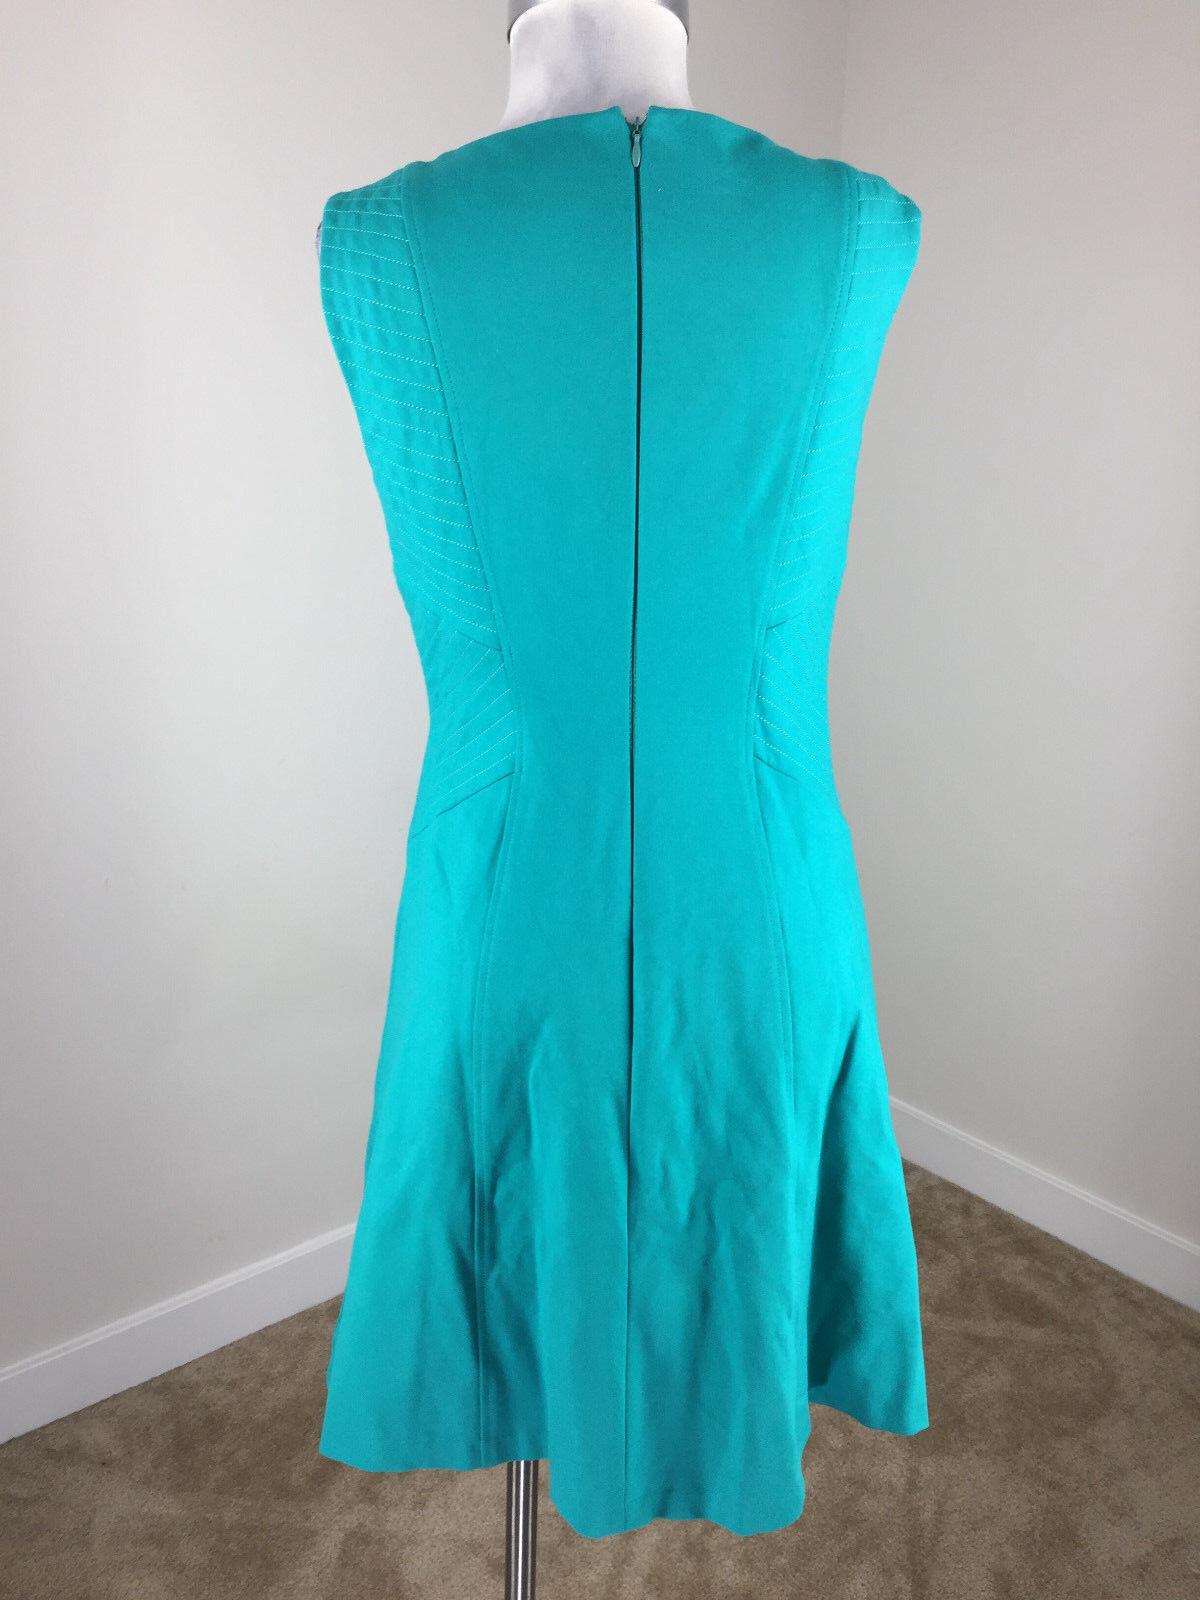 3b4427b5619 ... Antonio Melani S 4 Turquoise Dress Ponte knit sleeveless sleeveless  sleeveless Excellent a5c83a ...